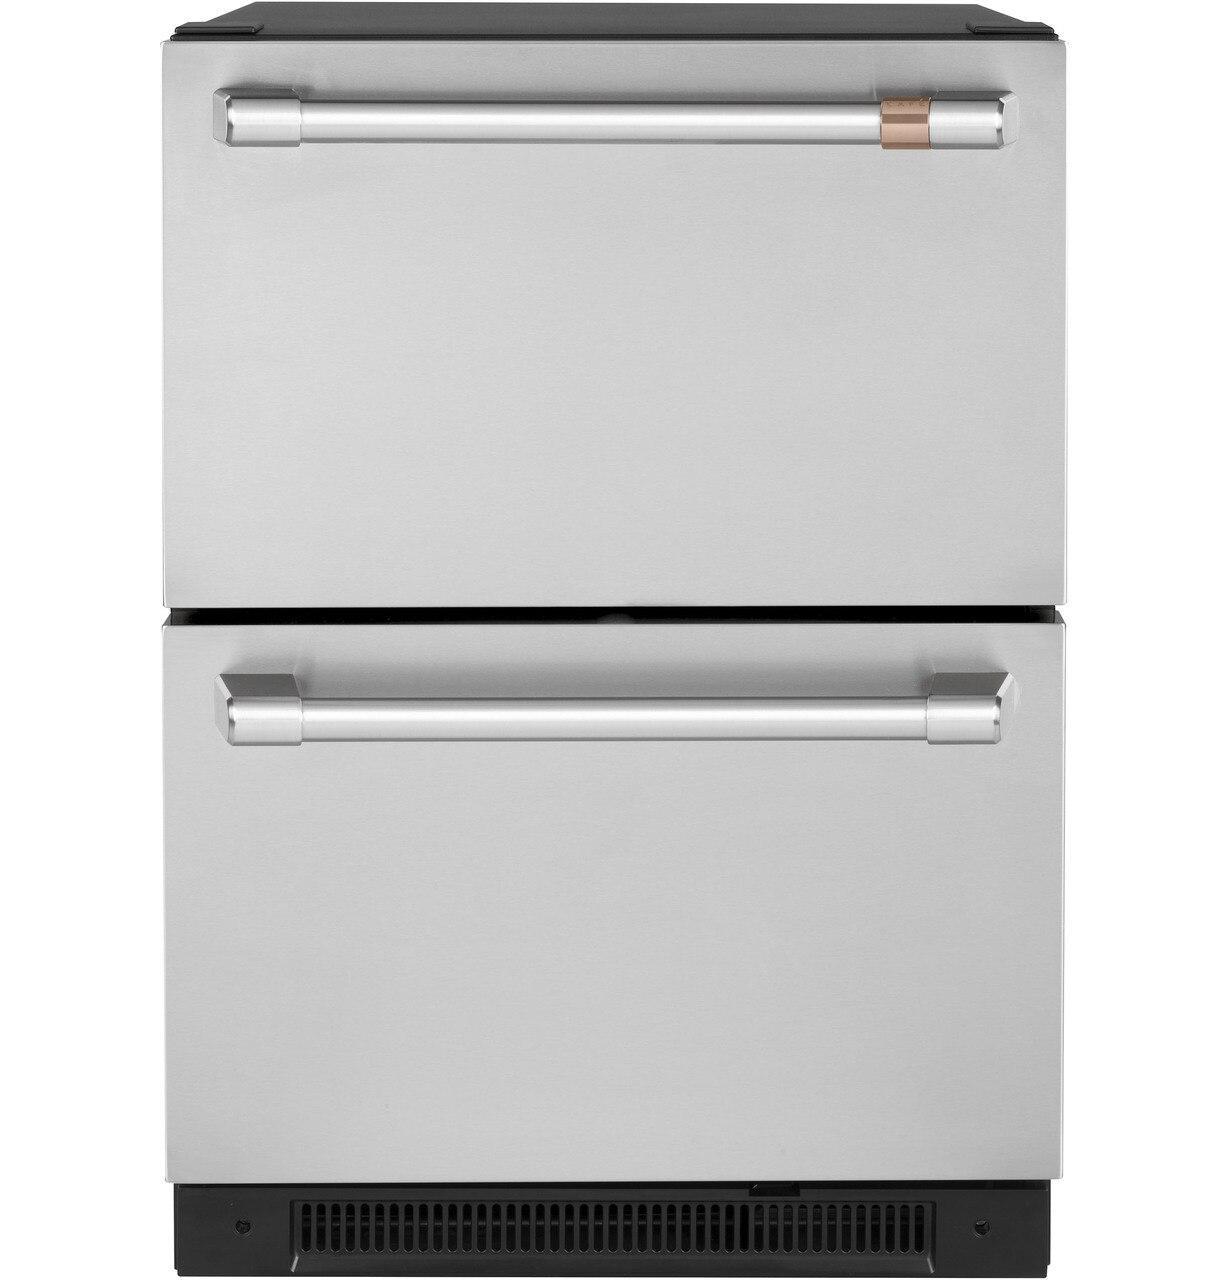 Cafe AppliancesCafe™ 5.7 Cu. Ft. Built-In Dual-Drawer Refrigerator